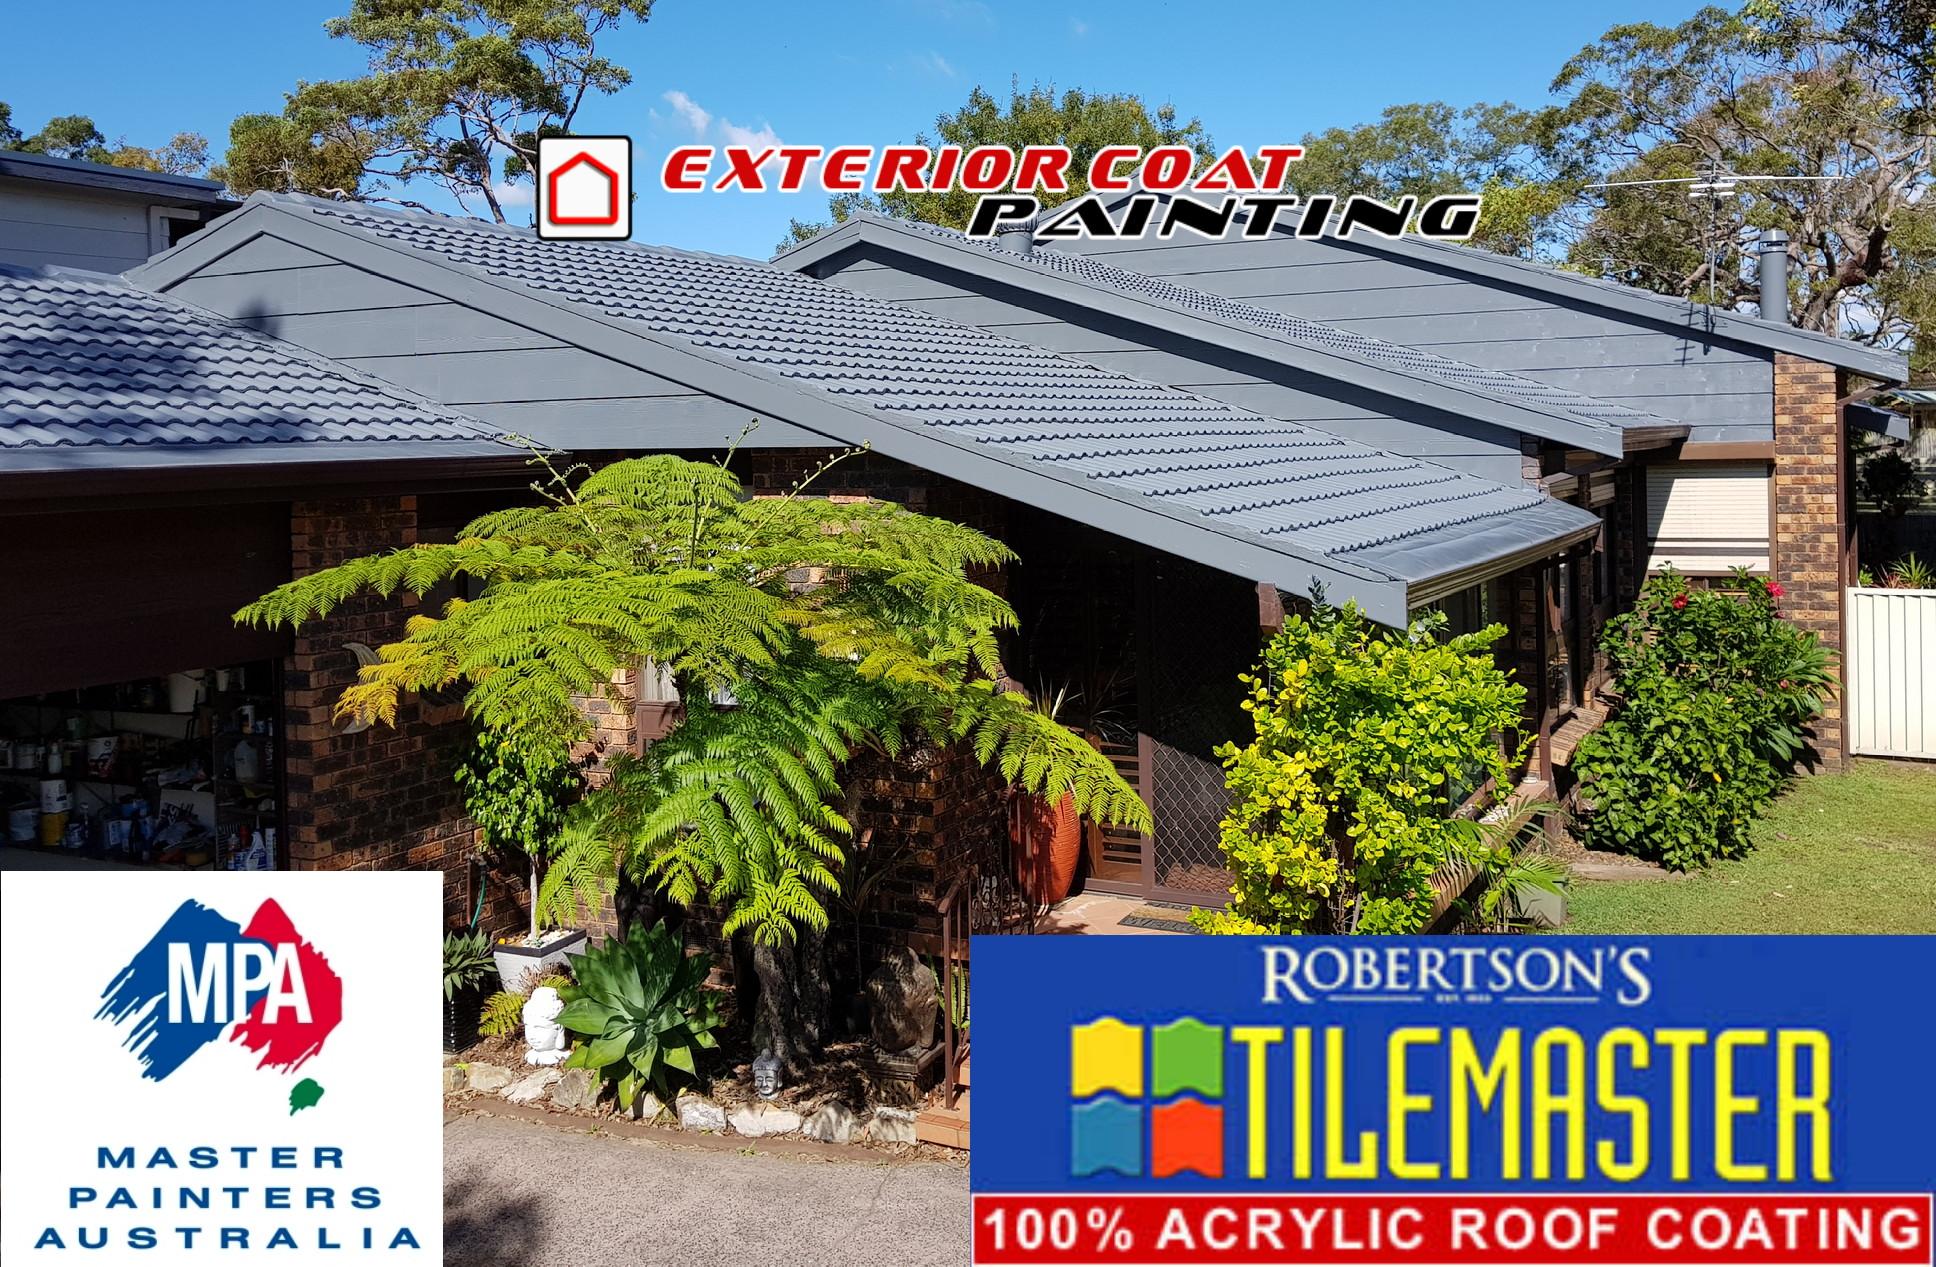 Cement Tile Roof Restoration In Budgewoi Exterior Coat